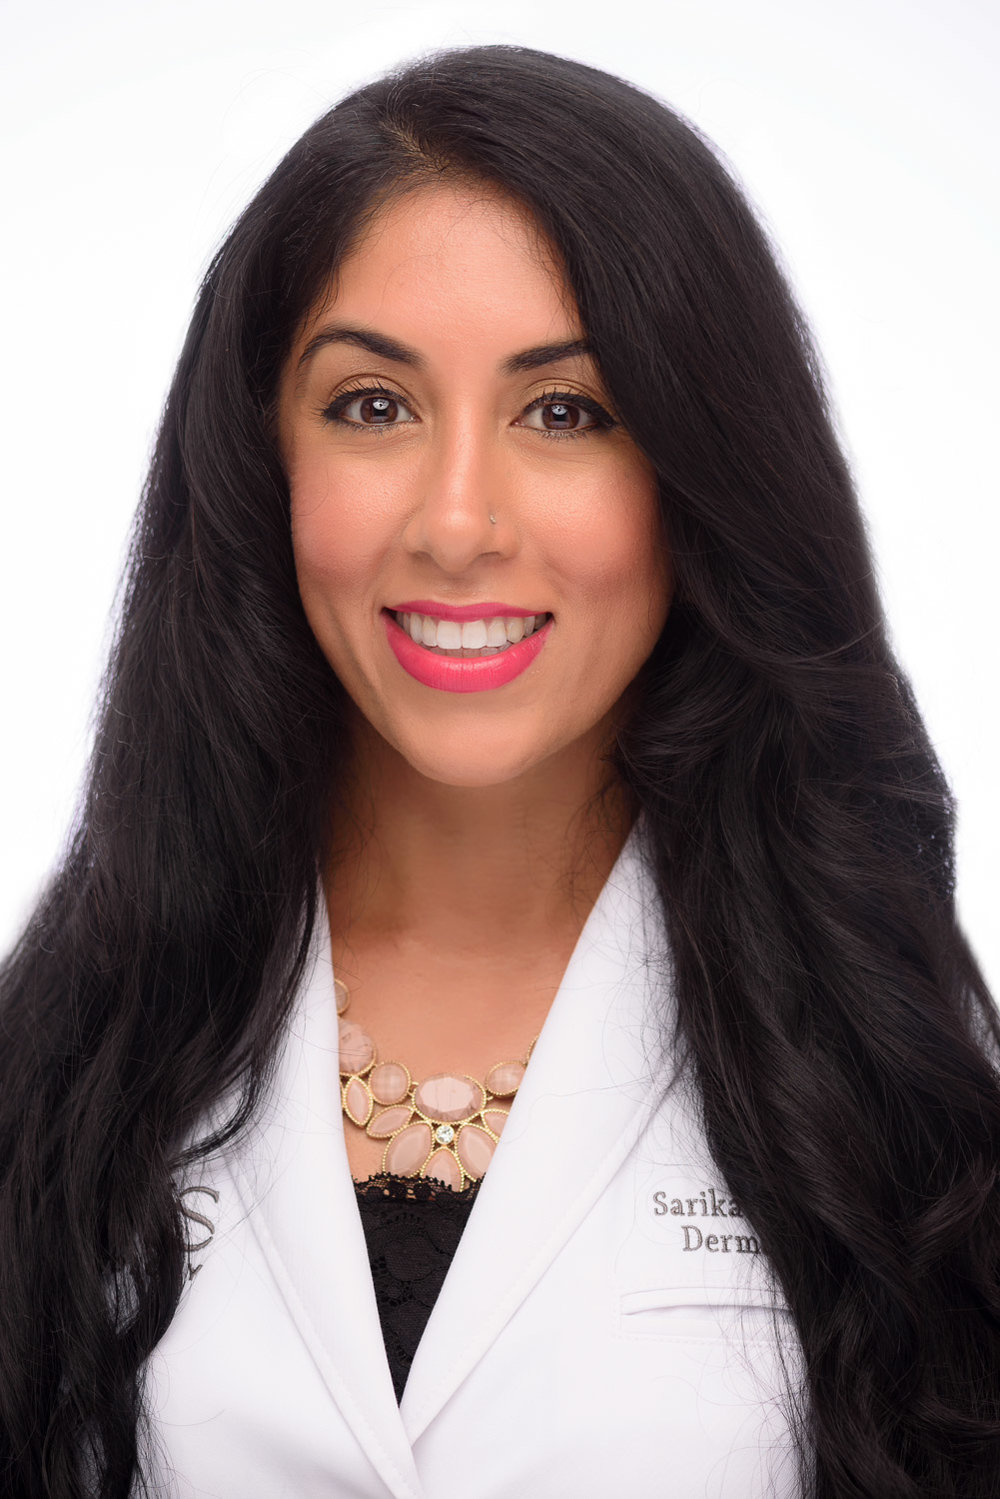 Sarika Snell Md Faad Integrated Dermatology Of K Street